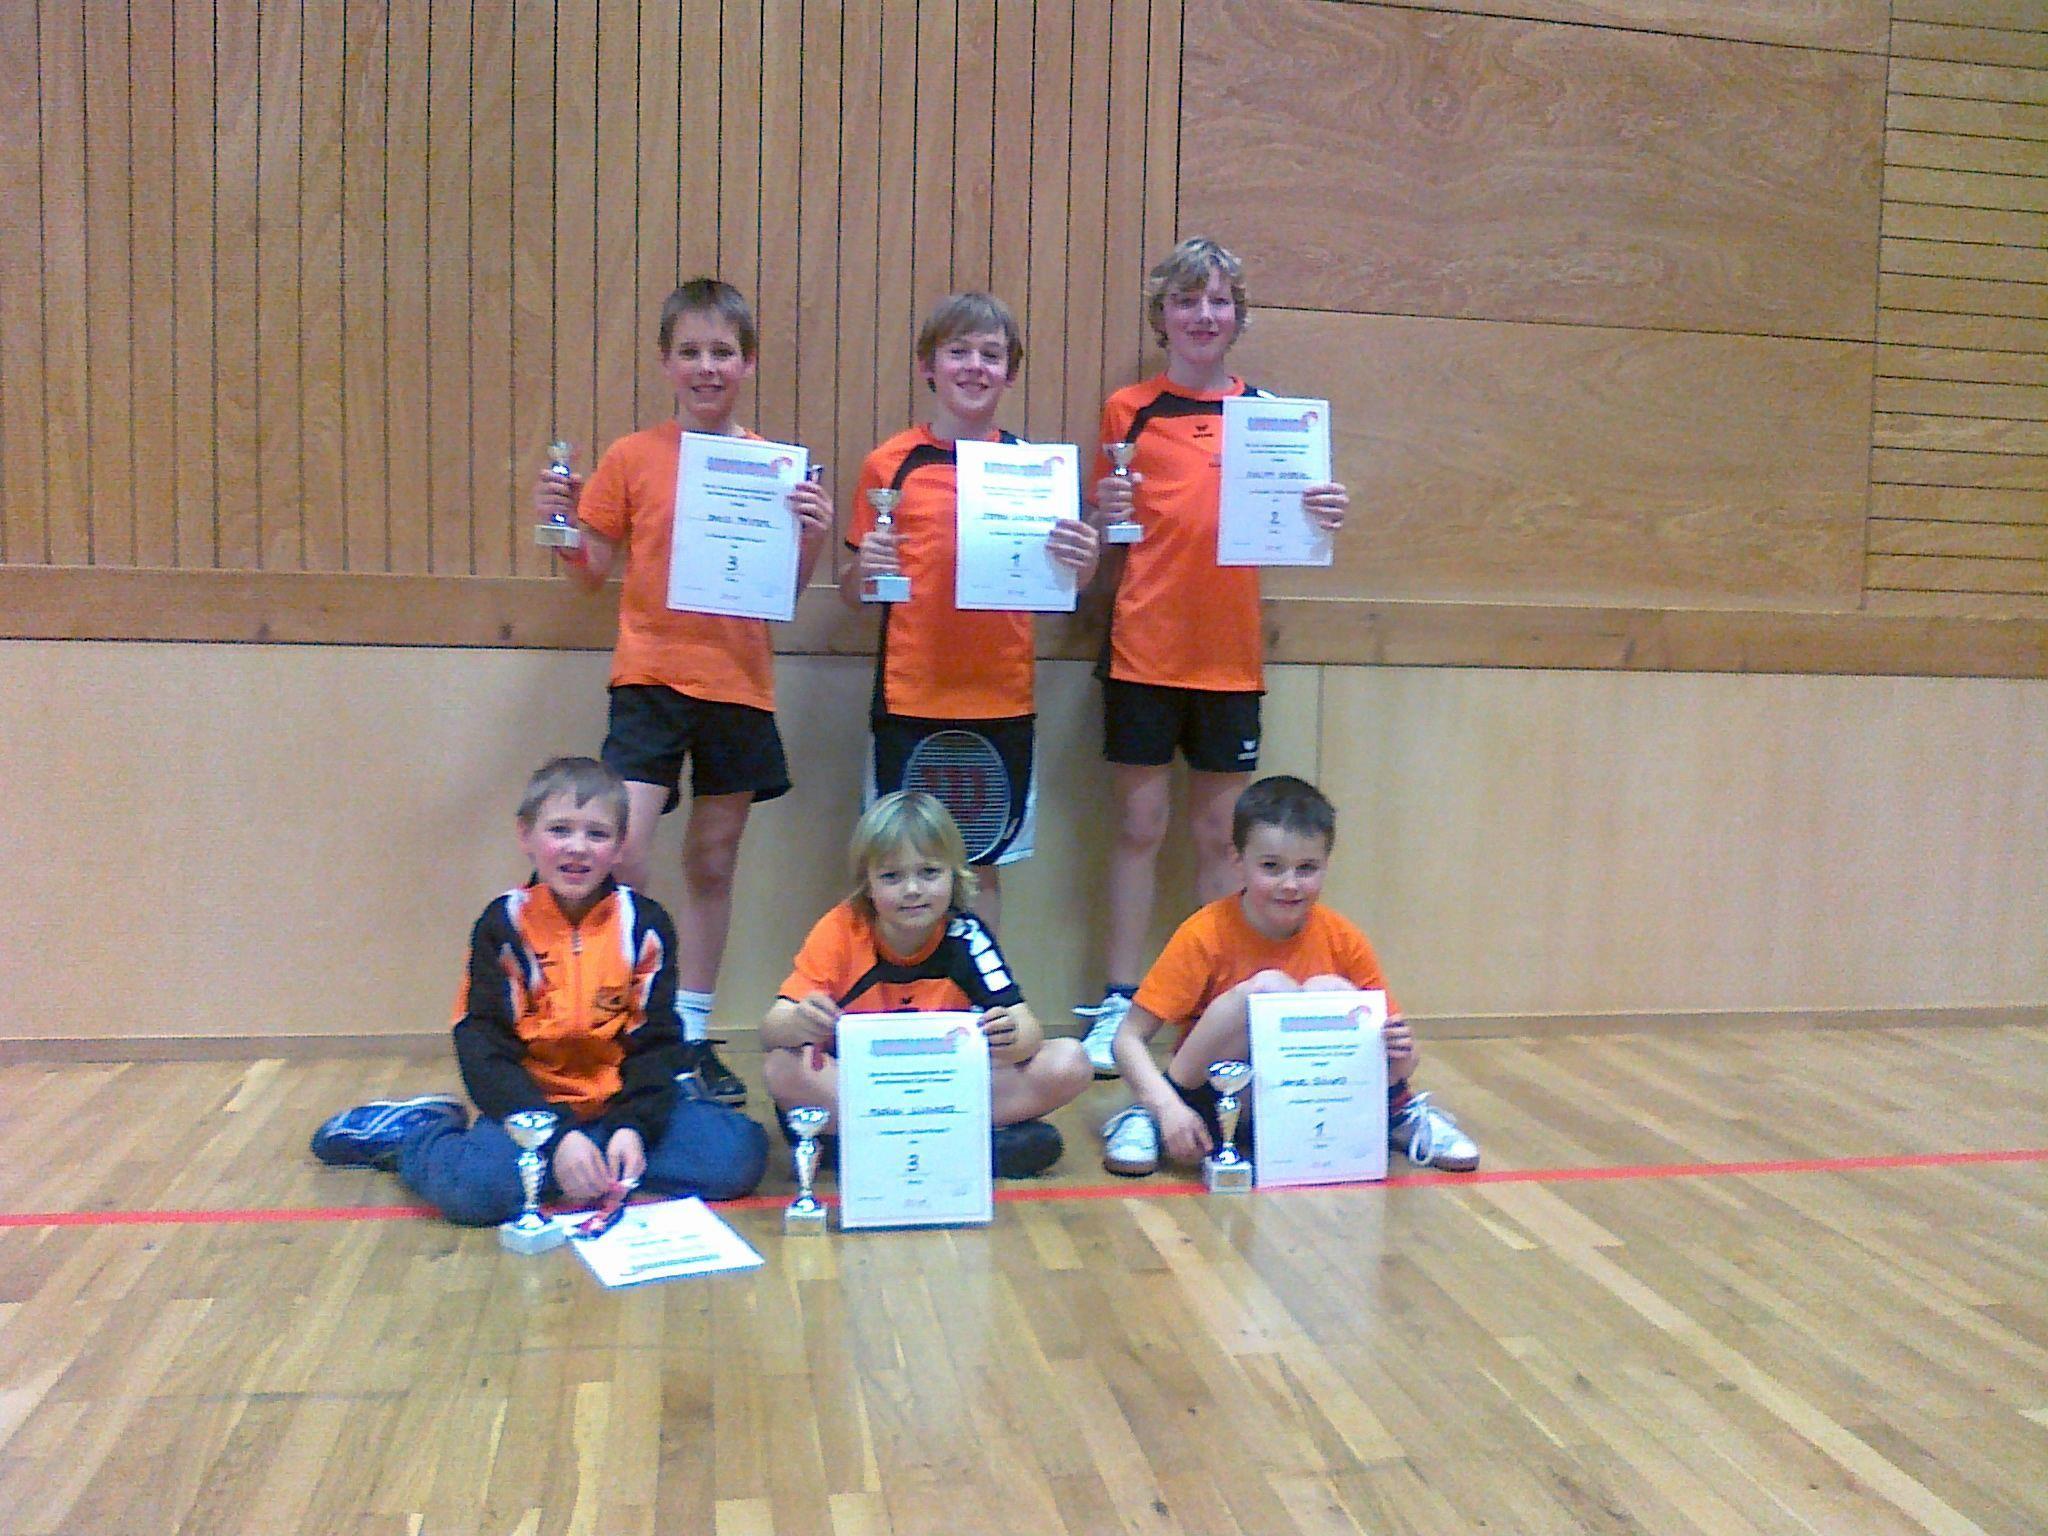 Siegerfoto der Schüler-Vereinsmeisterschaften